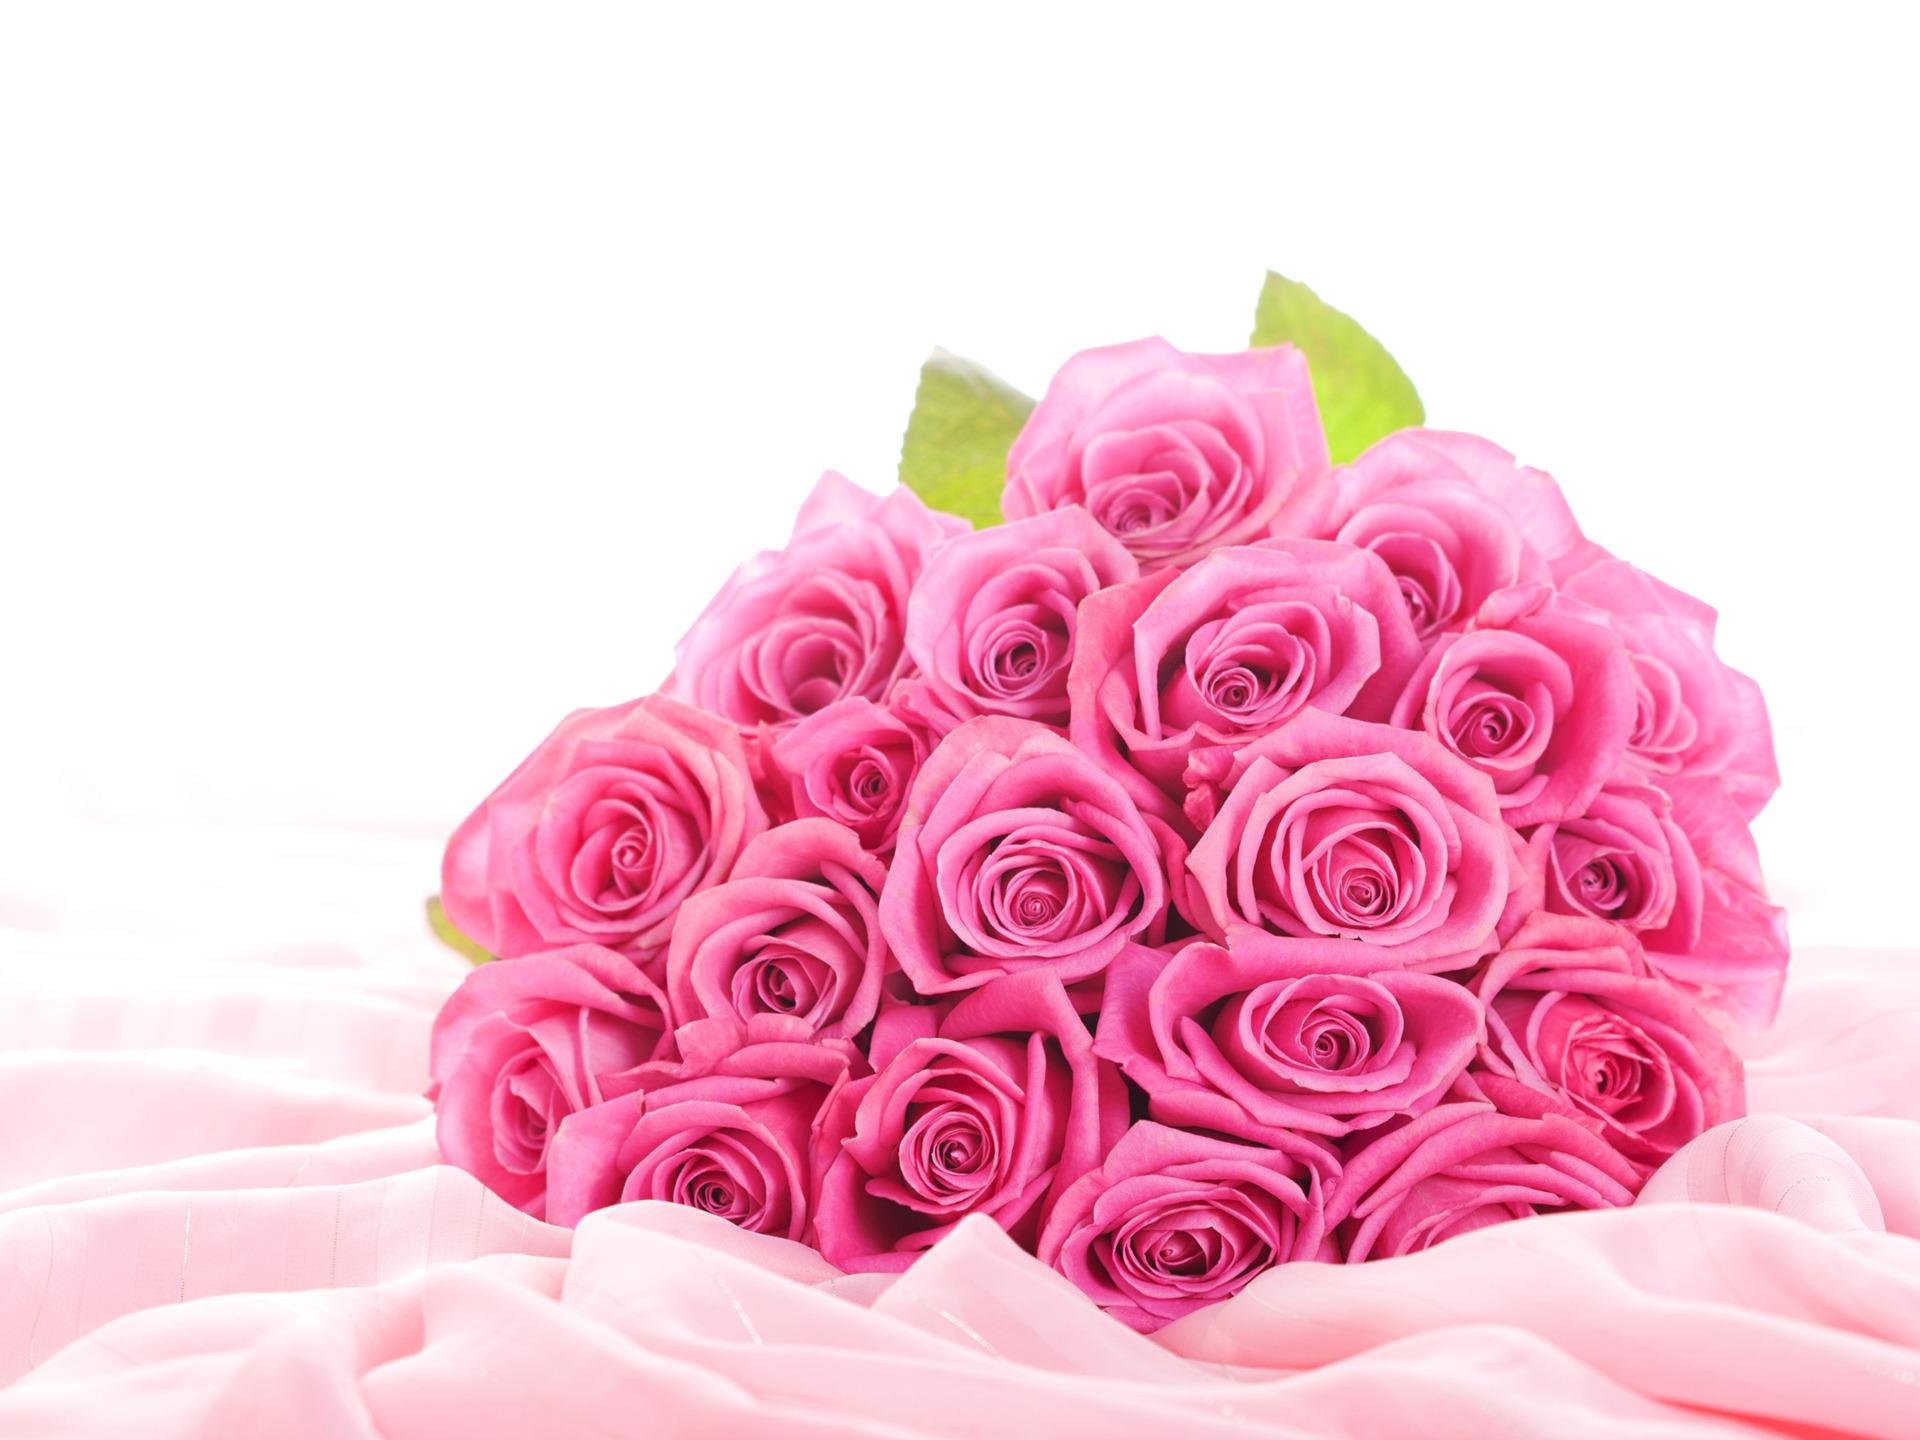 Pink Roses Desktop Backgrounds   Wallpaper High Definition High 1920x1440